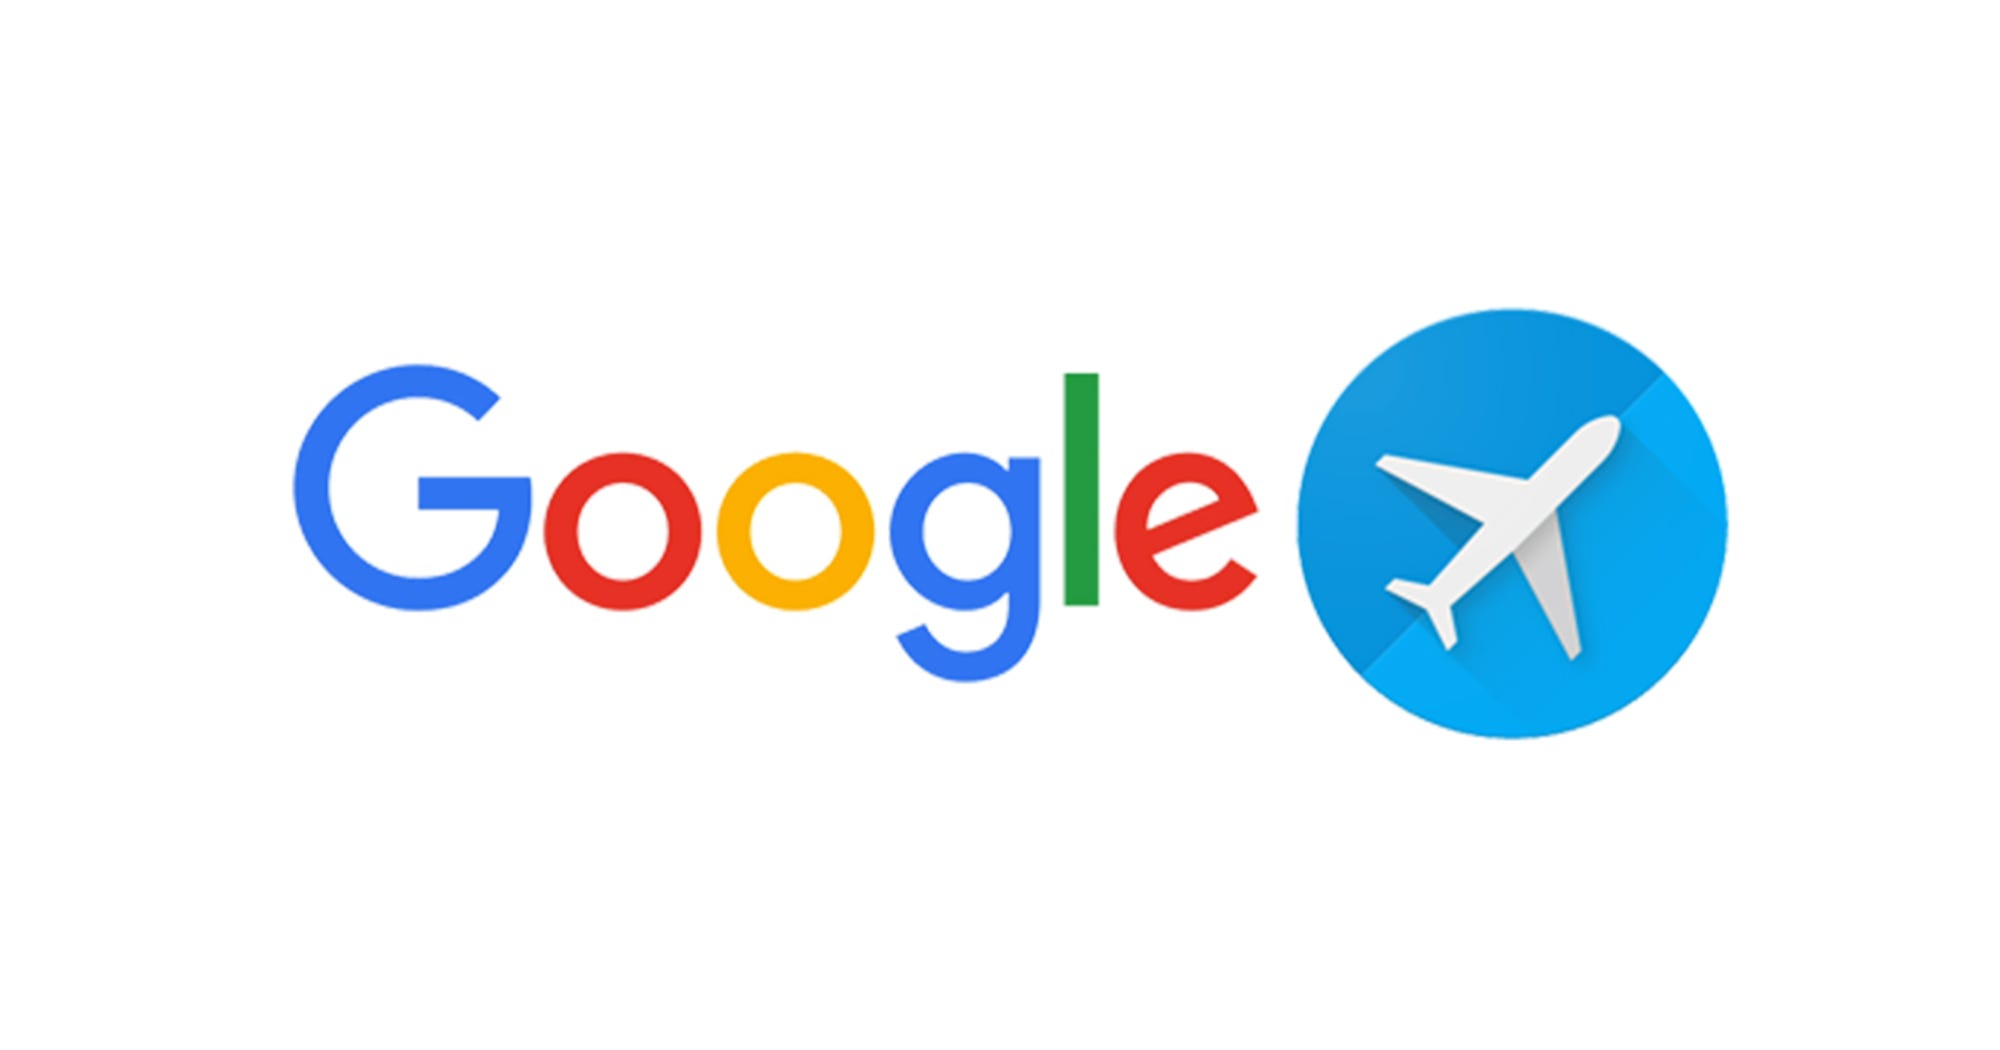 6 Life-Changing Google Flights Hacks Every Traveler Needs To Know